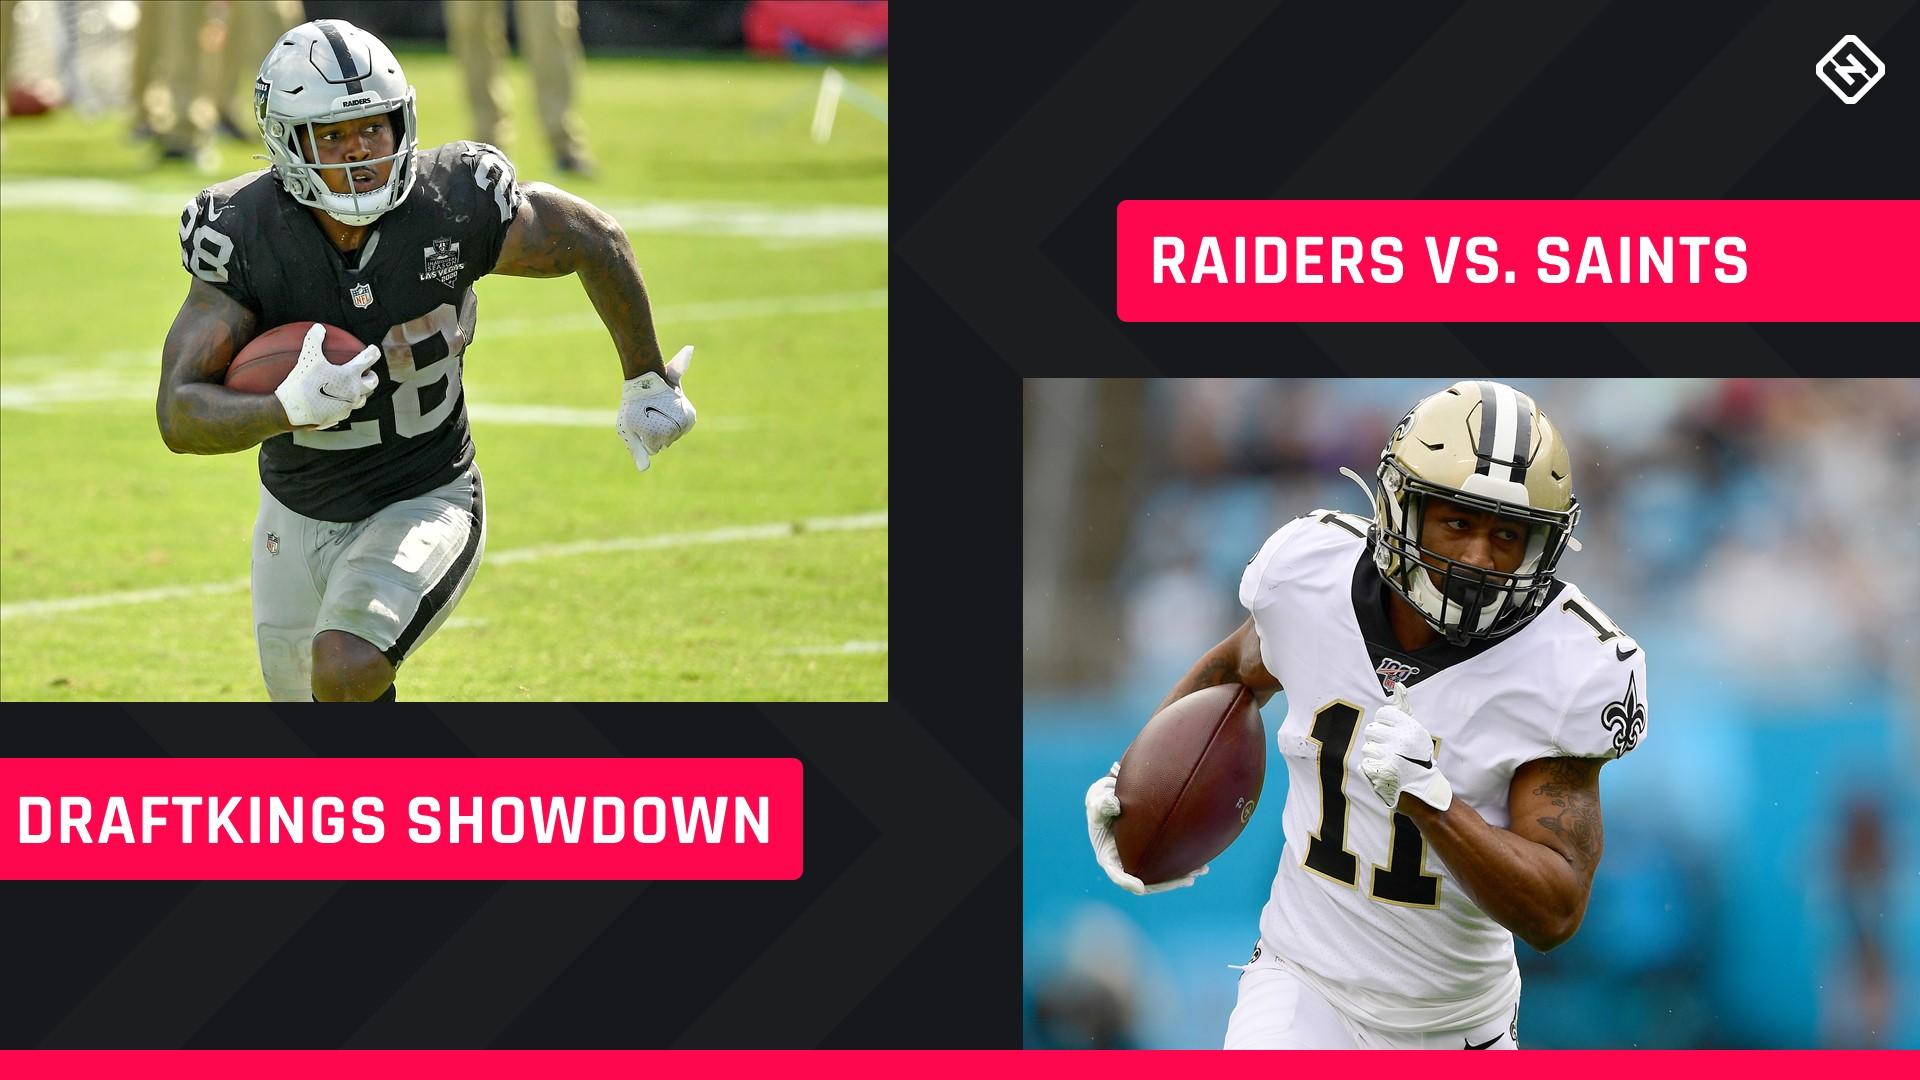 Monday Night Football DraftKings Picks: NFL DFS lineup advice for Week 2 Saints-Raiders Showdown tournaments - sporting news